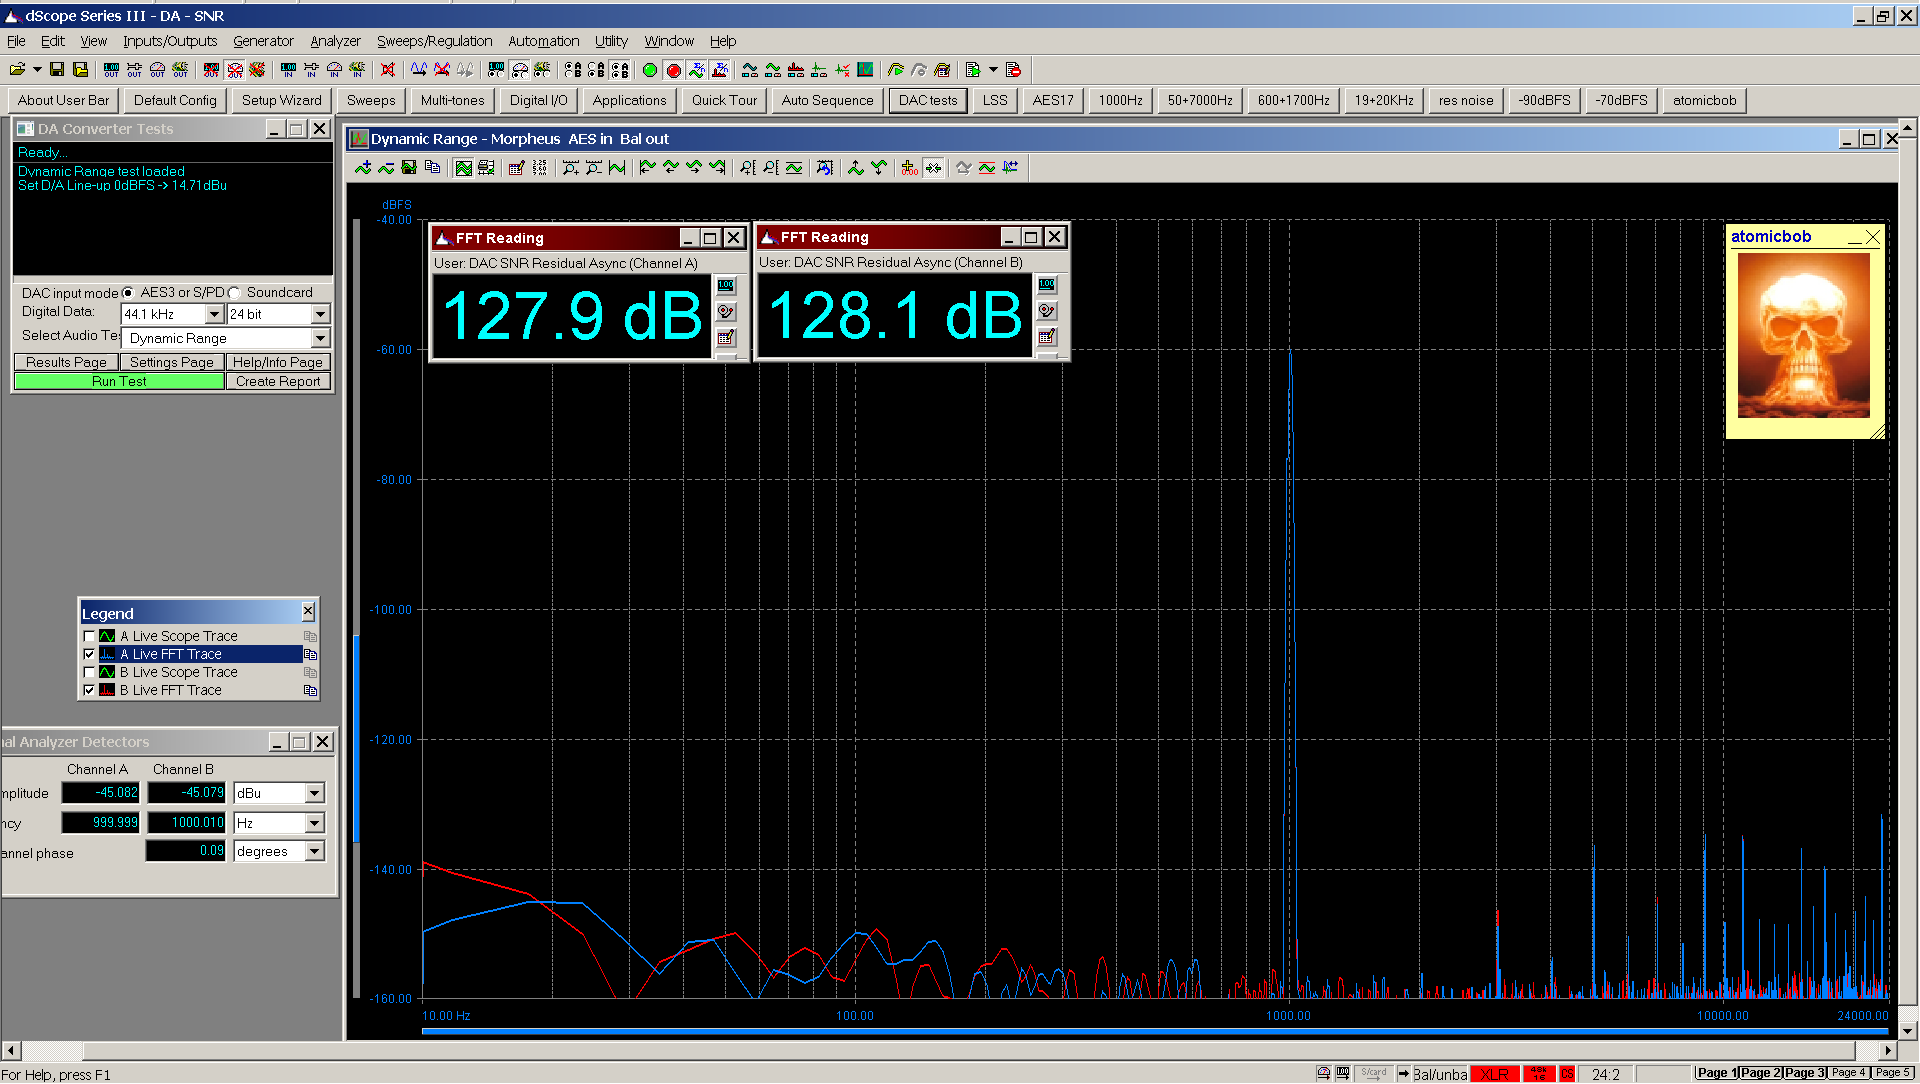 20200717 morpheus dynamic range FFT AES Bal.png